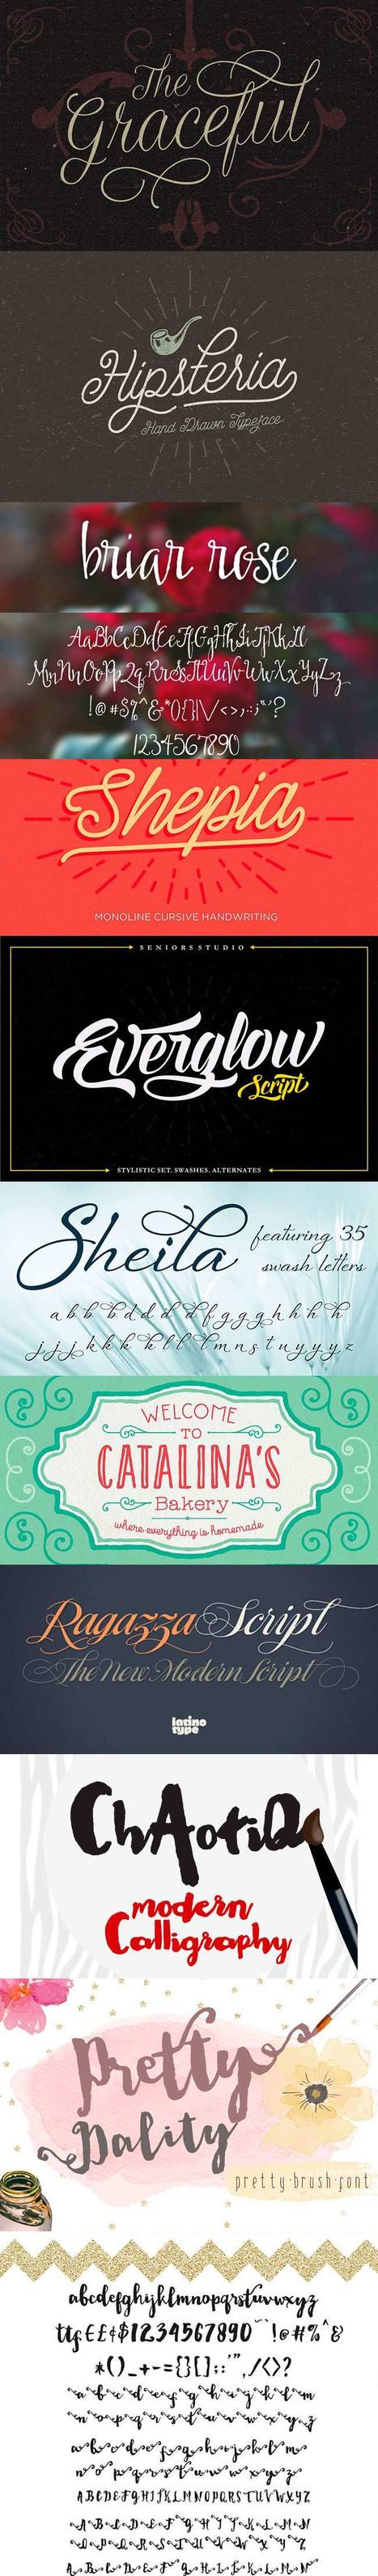 Awesome Script Font Bundle: 10 Gorgeous Typefaces for $27 (rrp $485) | Remi Vee - Social Media | Scoop.it